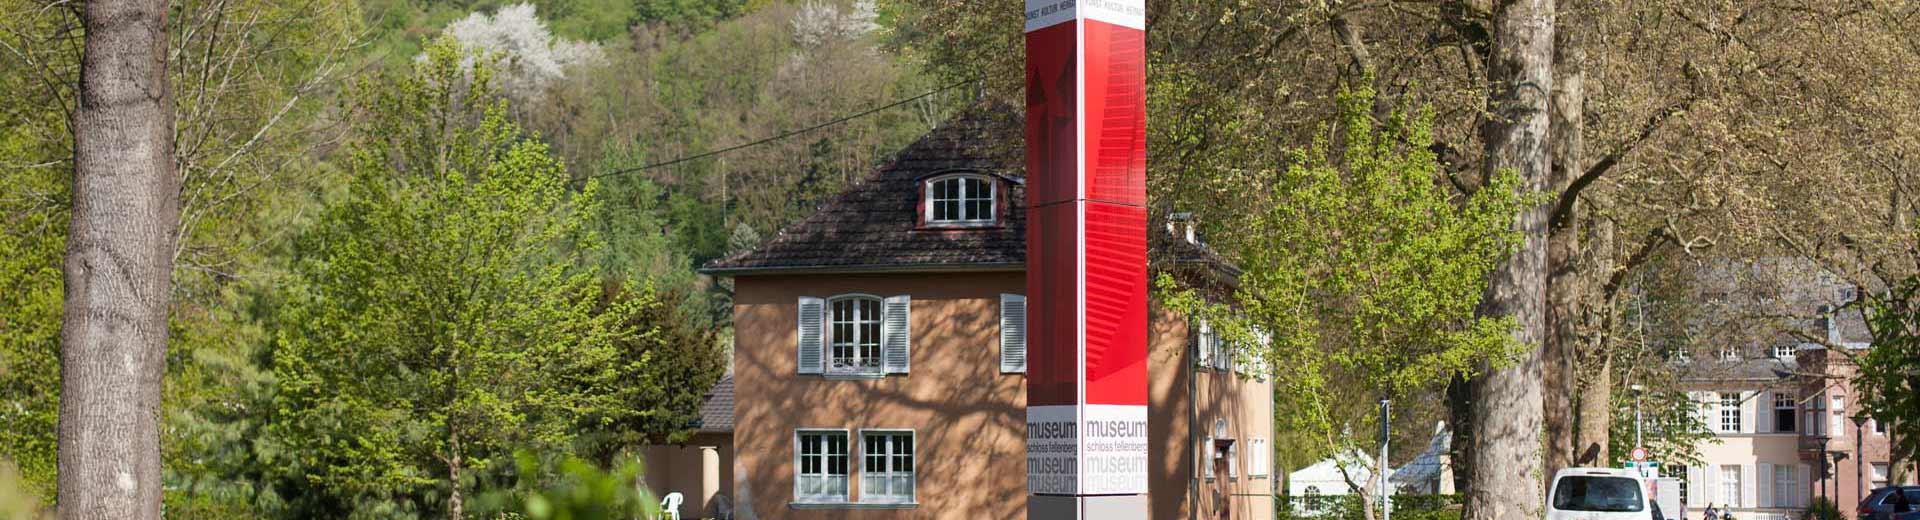 Titel_Keramik_Schild_Merzig_Museum